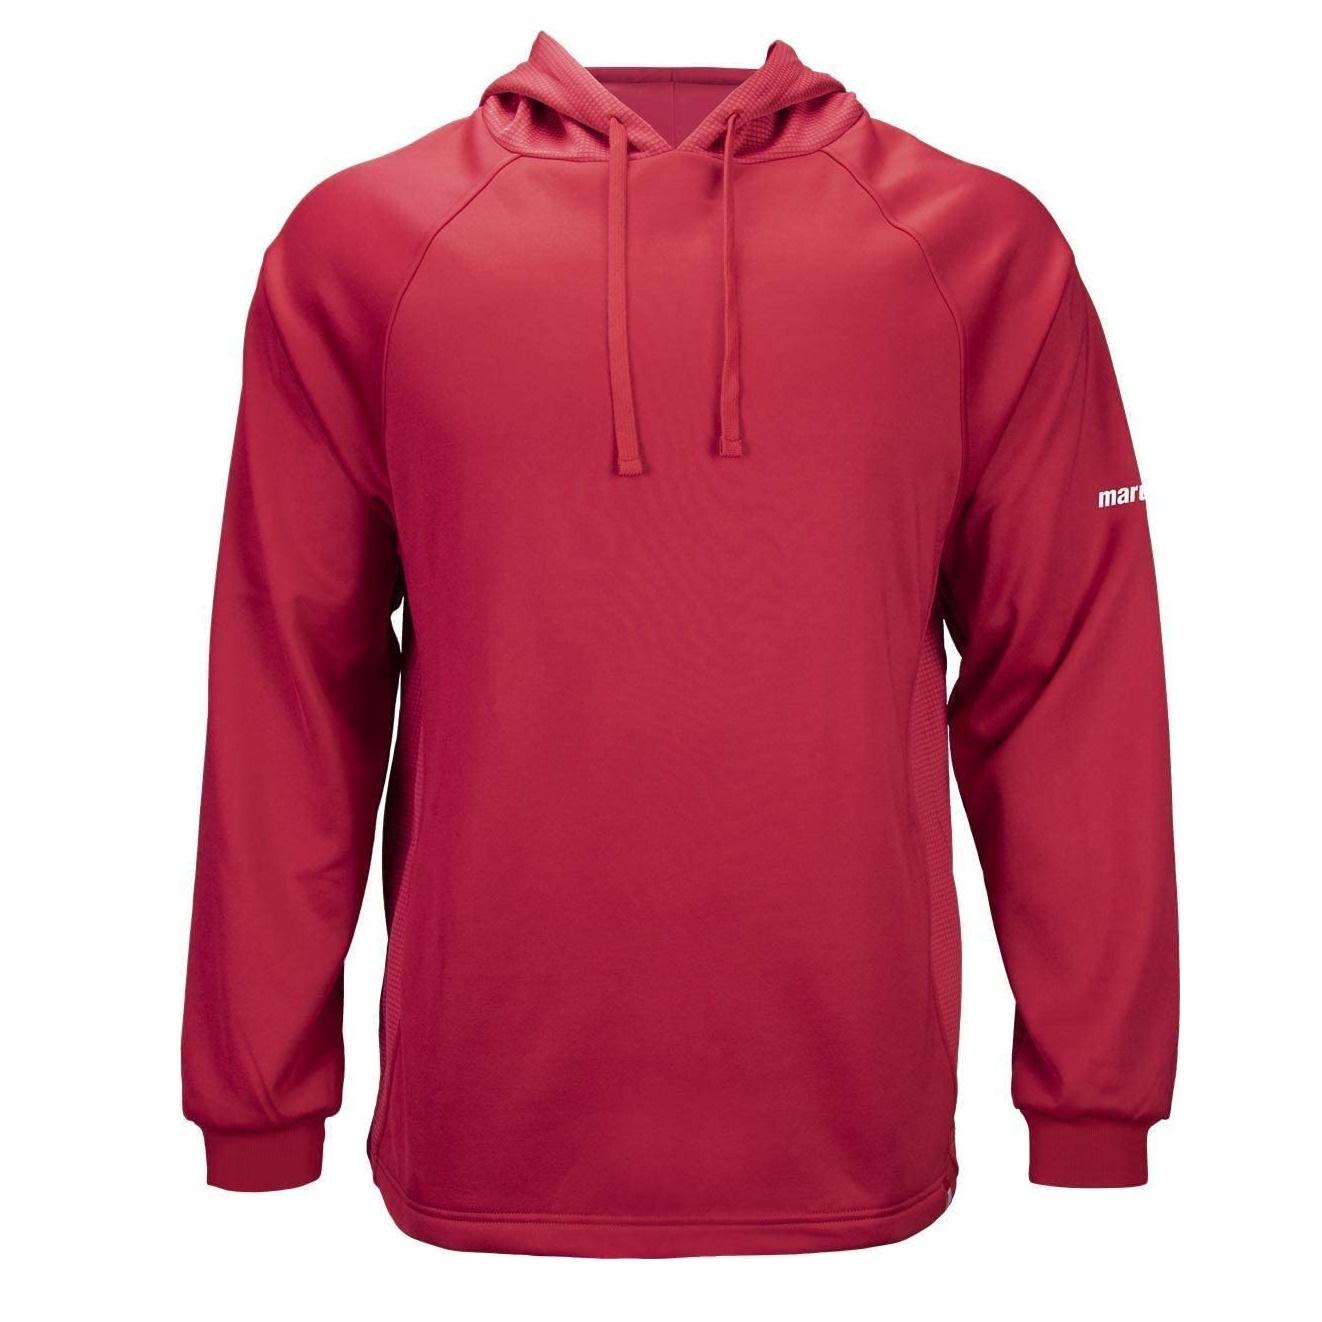 marucci-sports-mens-warm-up-tech-fleece-matflhtc-red-adult-large-baseball-hoodie MATFLHTC-R-AL   Marucci Sports - Warm-Up Tech Fleece MATFLHTCY Baseball Hoodie. As a